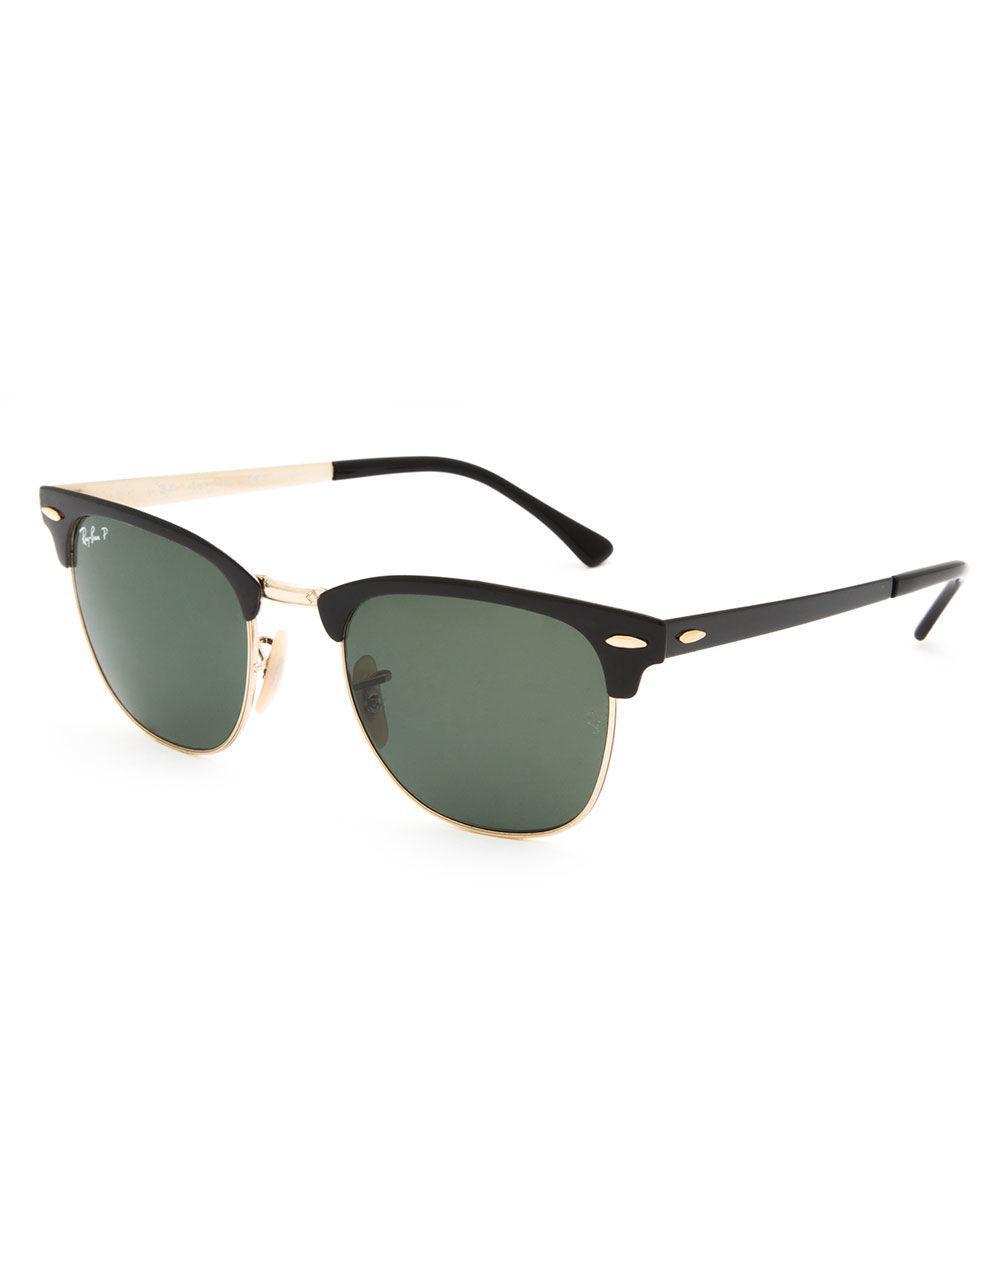 bd92f92b0c4 Ray-Ban. Men s Clubmaster Metal Black   Green Classic Polarized Sunglasses